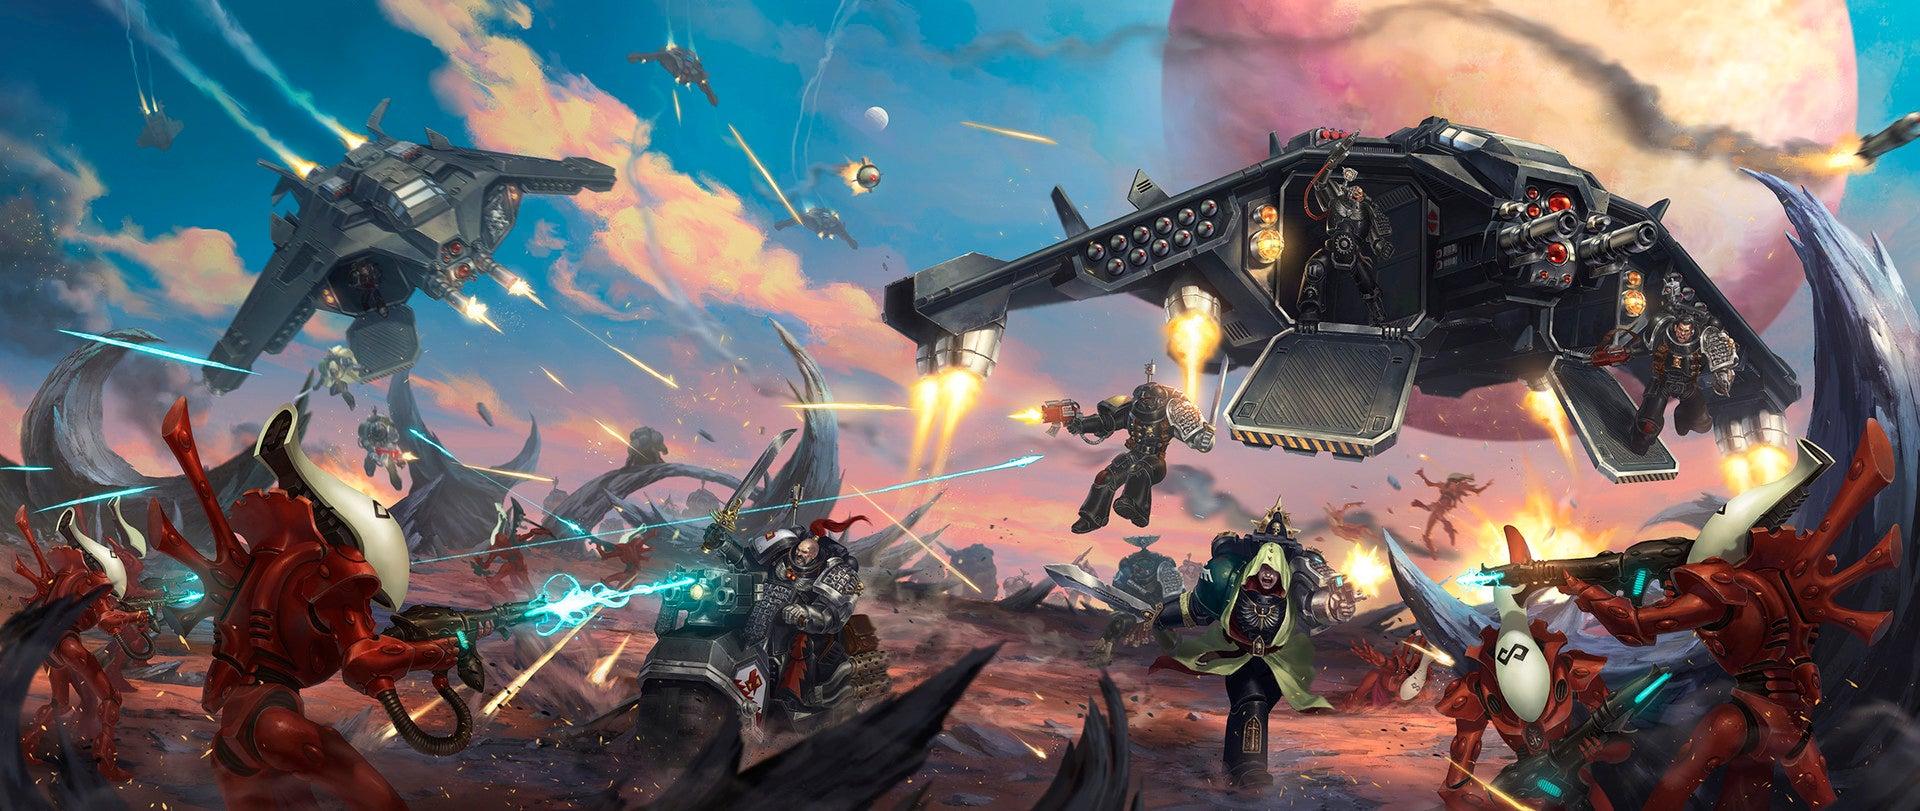 Fine Art: Warhammer 40K Battles Are Never Subtle | Kotaku Australia